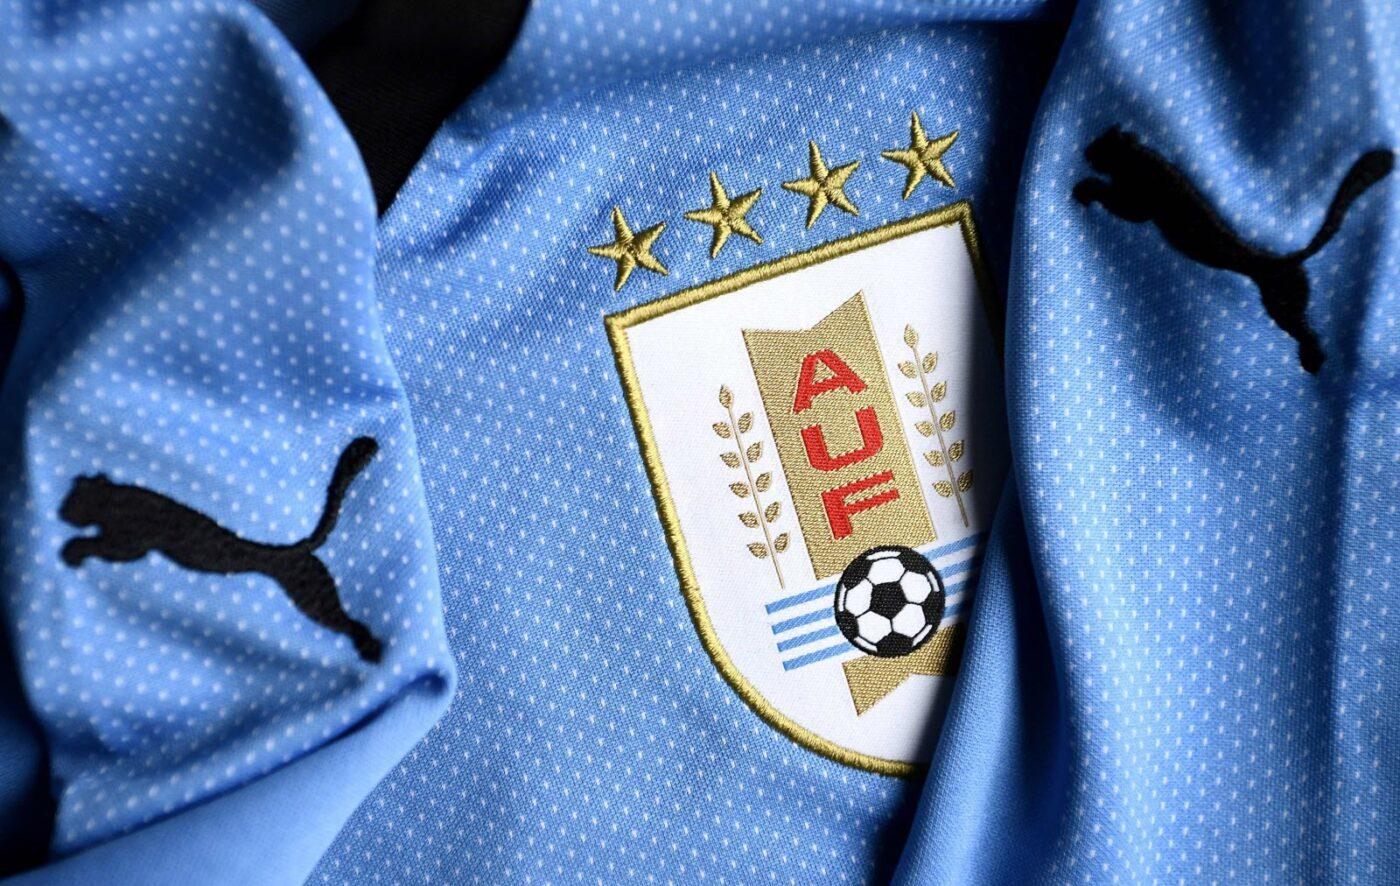 Maillot Uruguay 4 étoiles